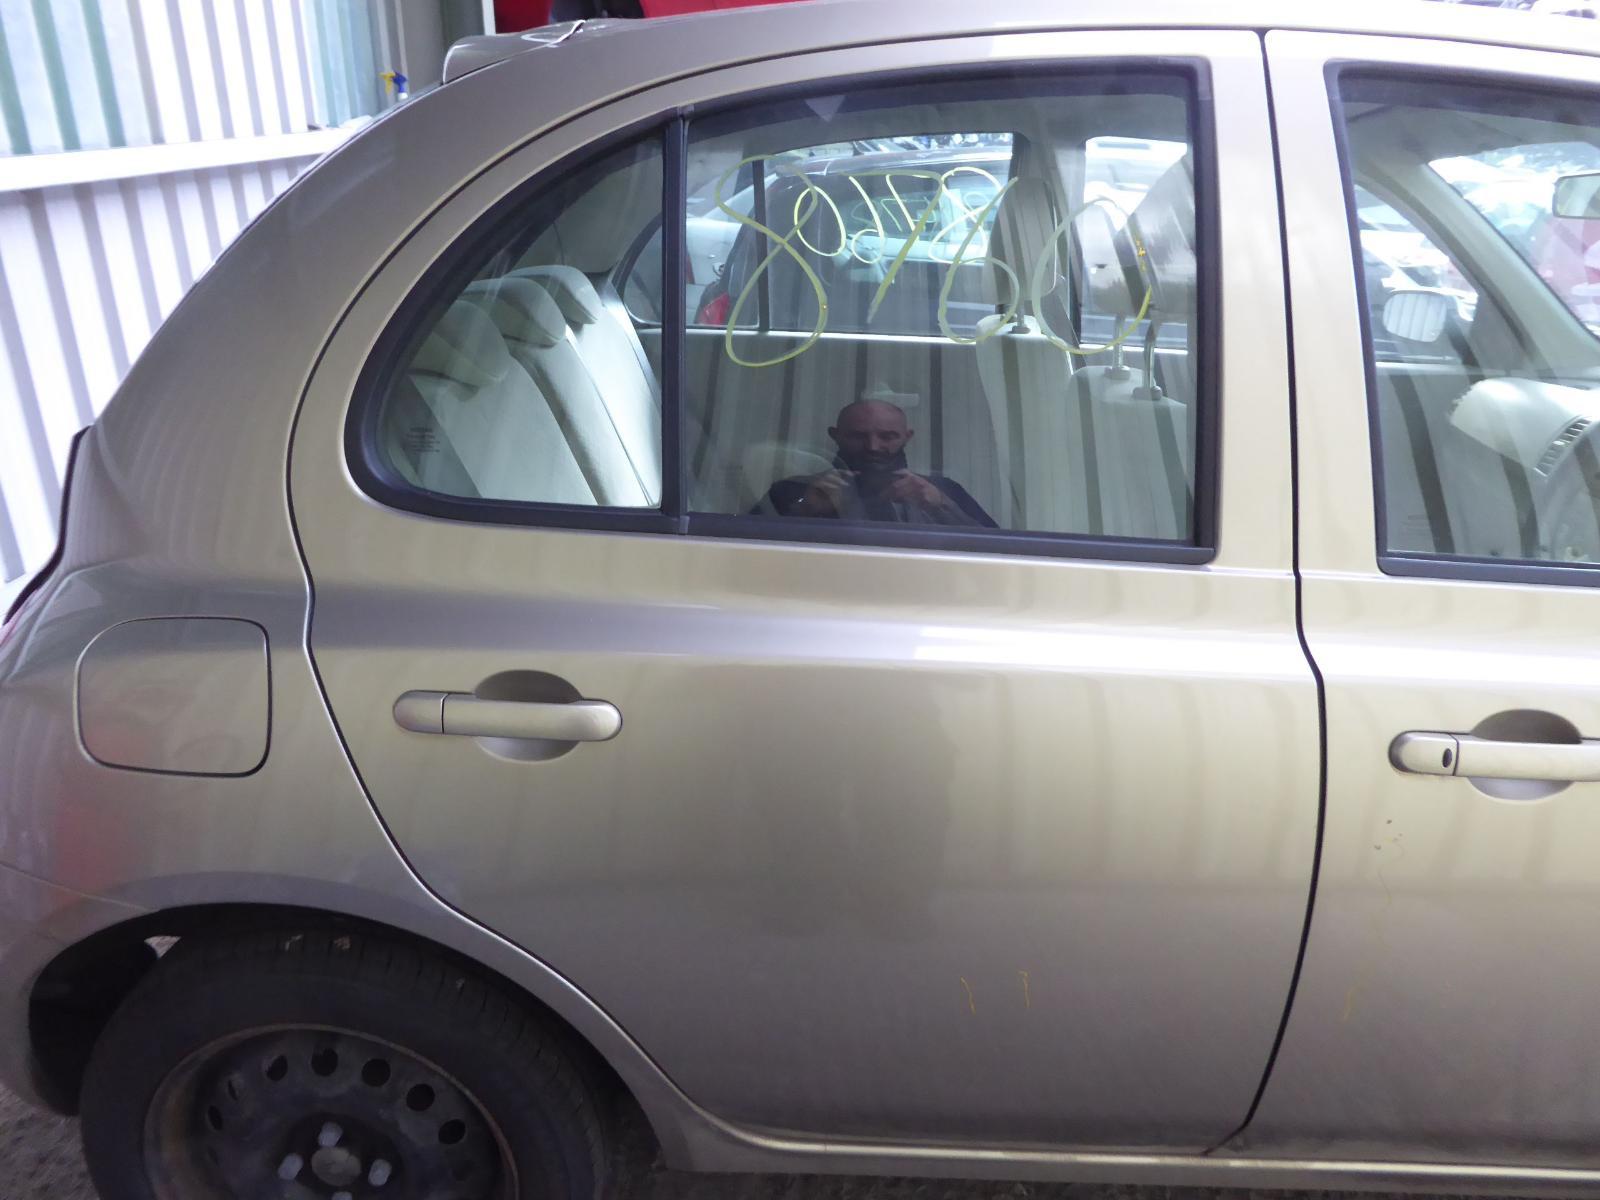 View Auto part R Rear Door NISSAN MICRA 2005